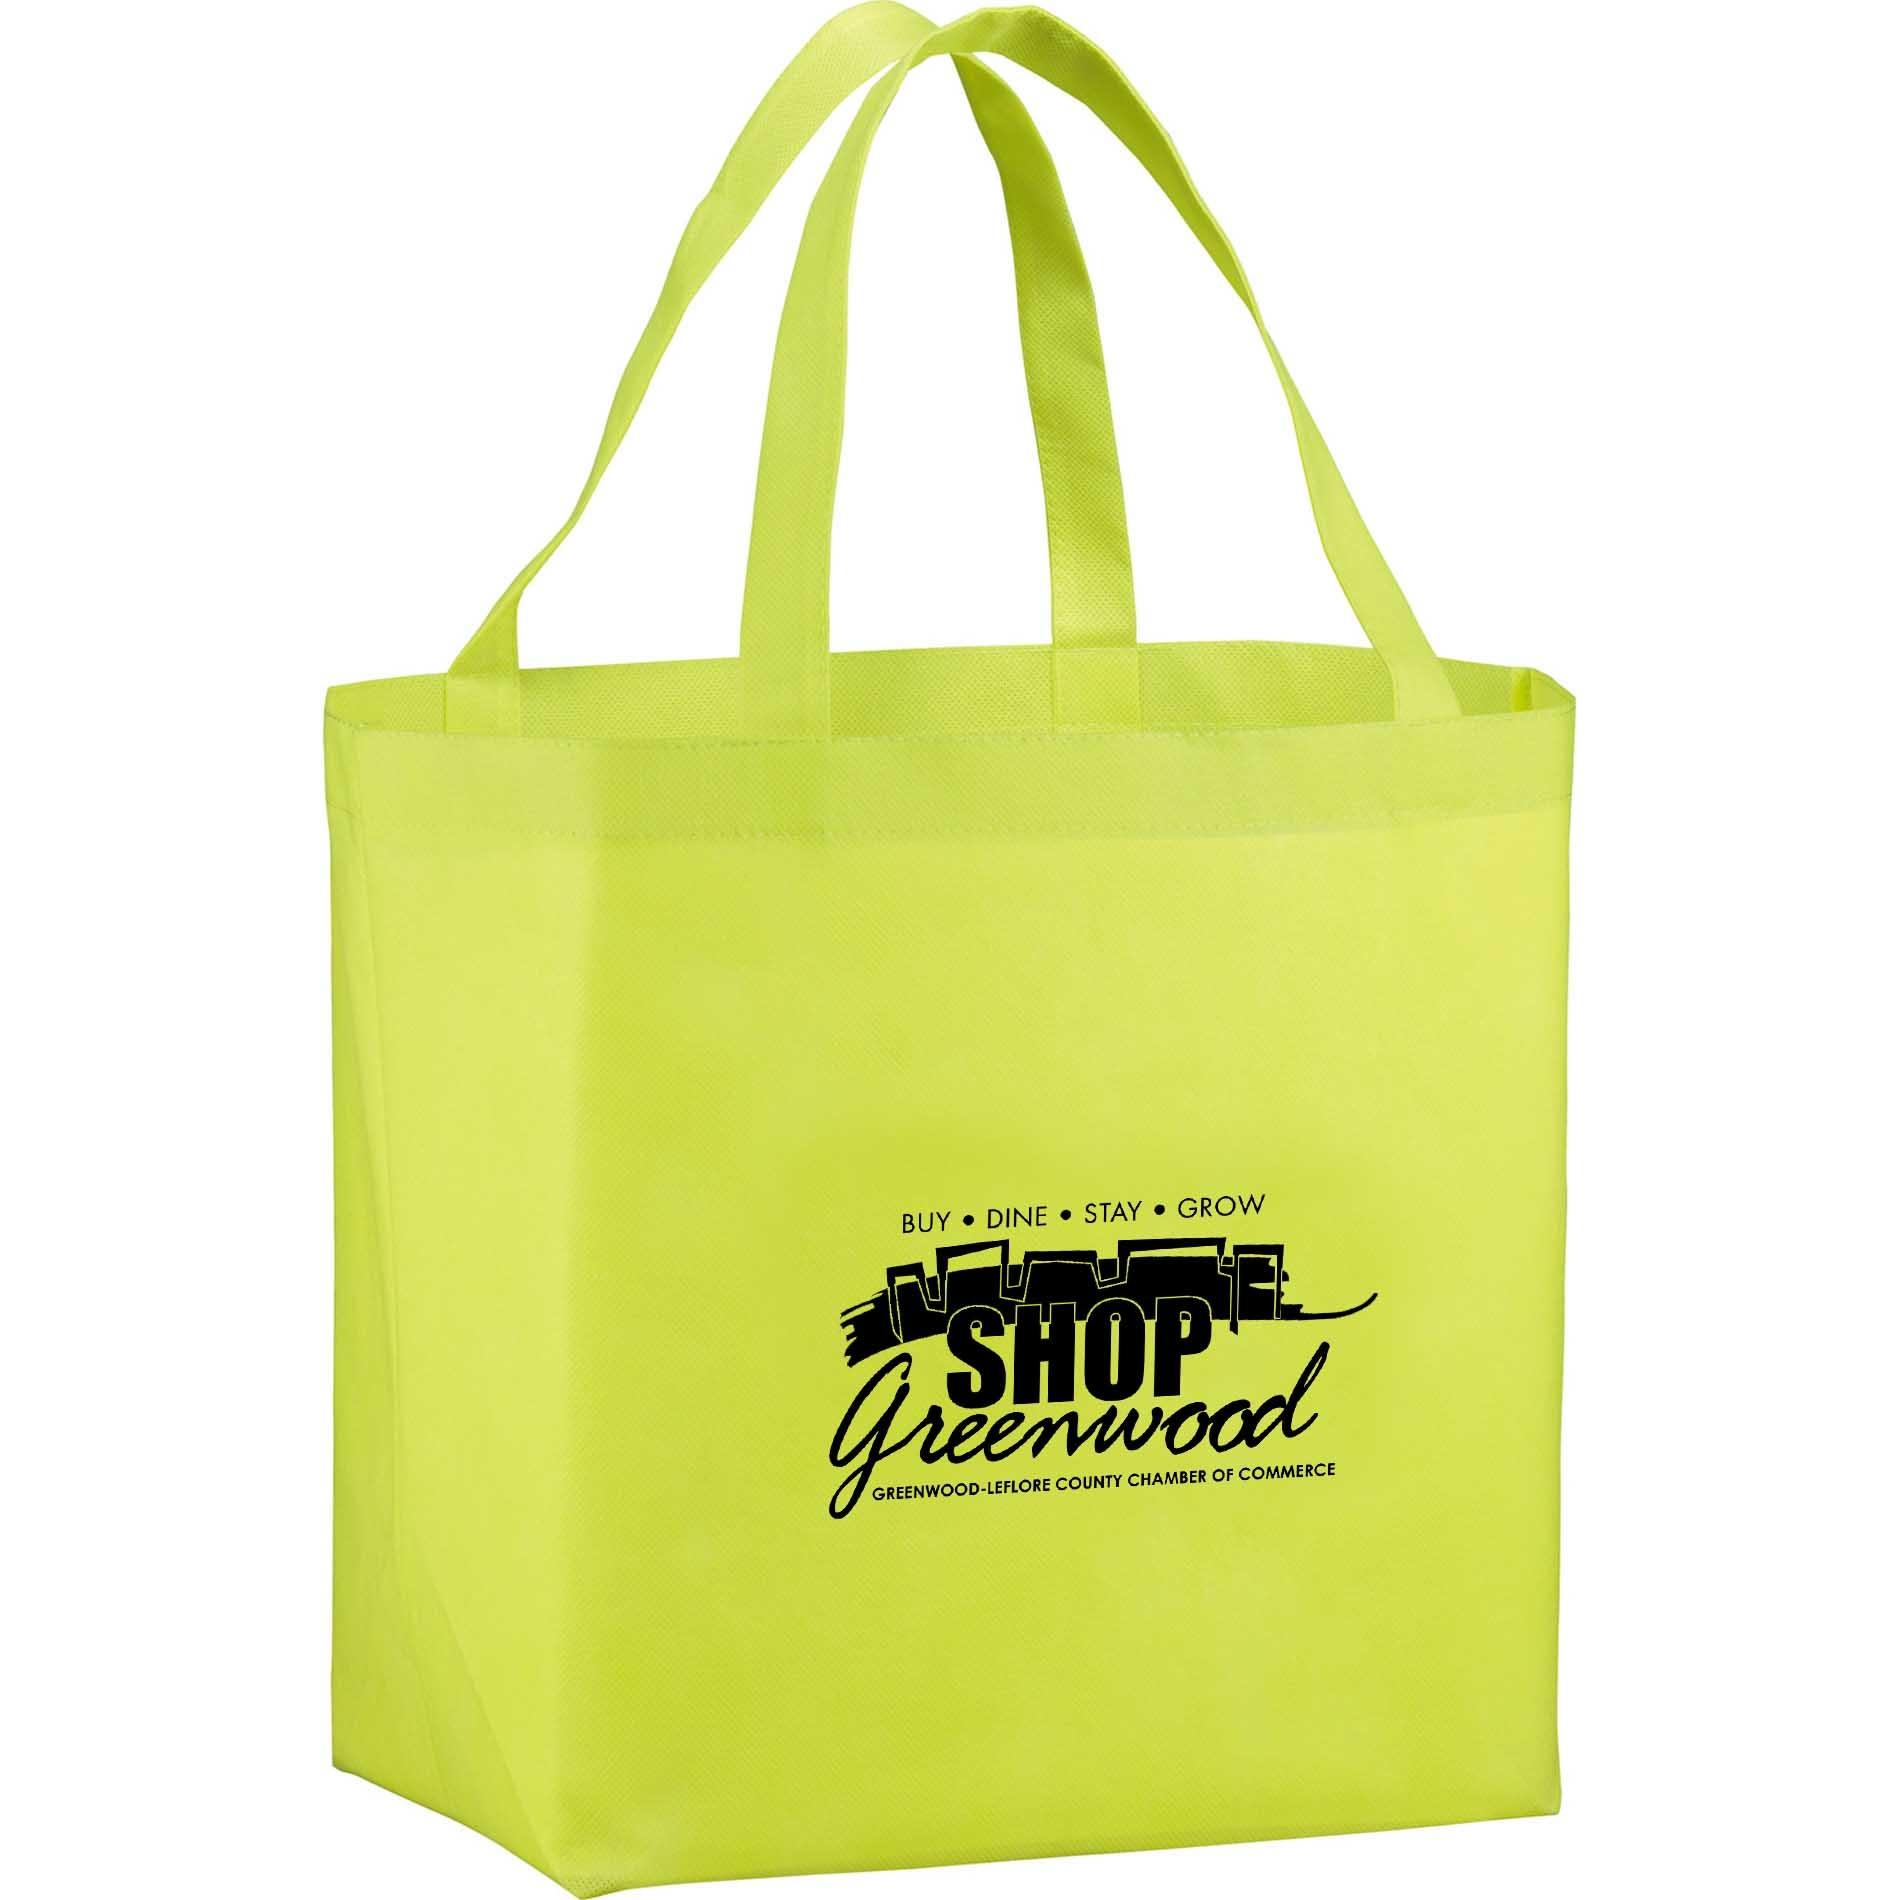 Shop Greenwood Tote Bag